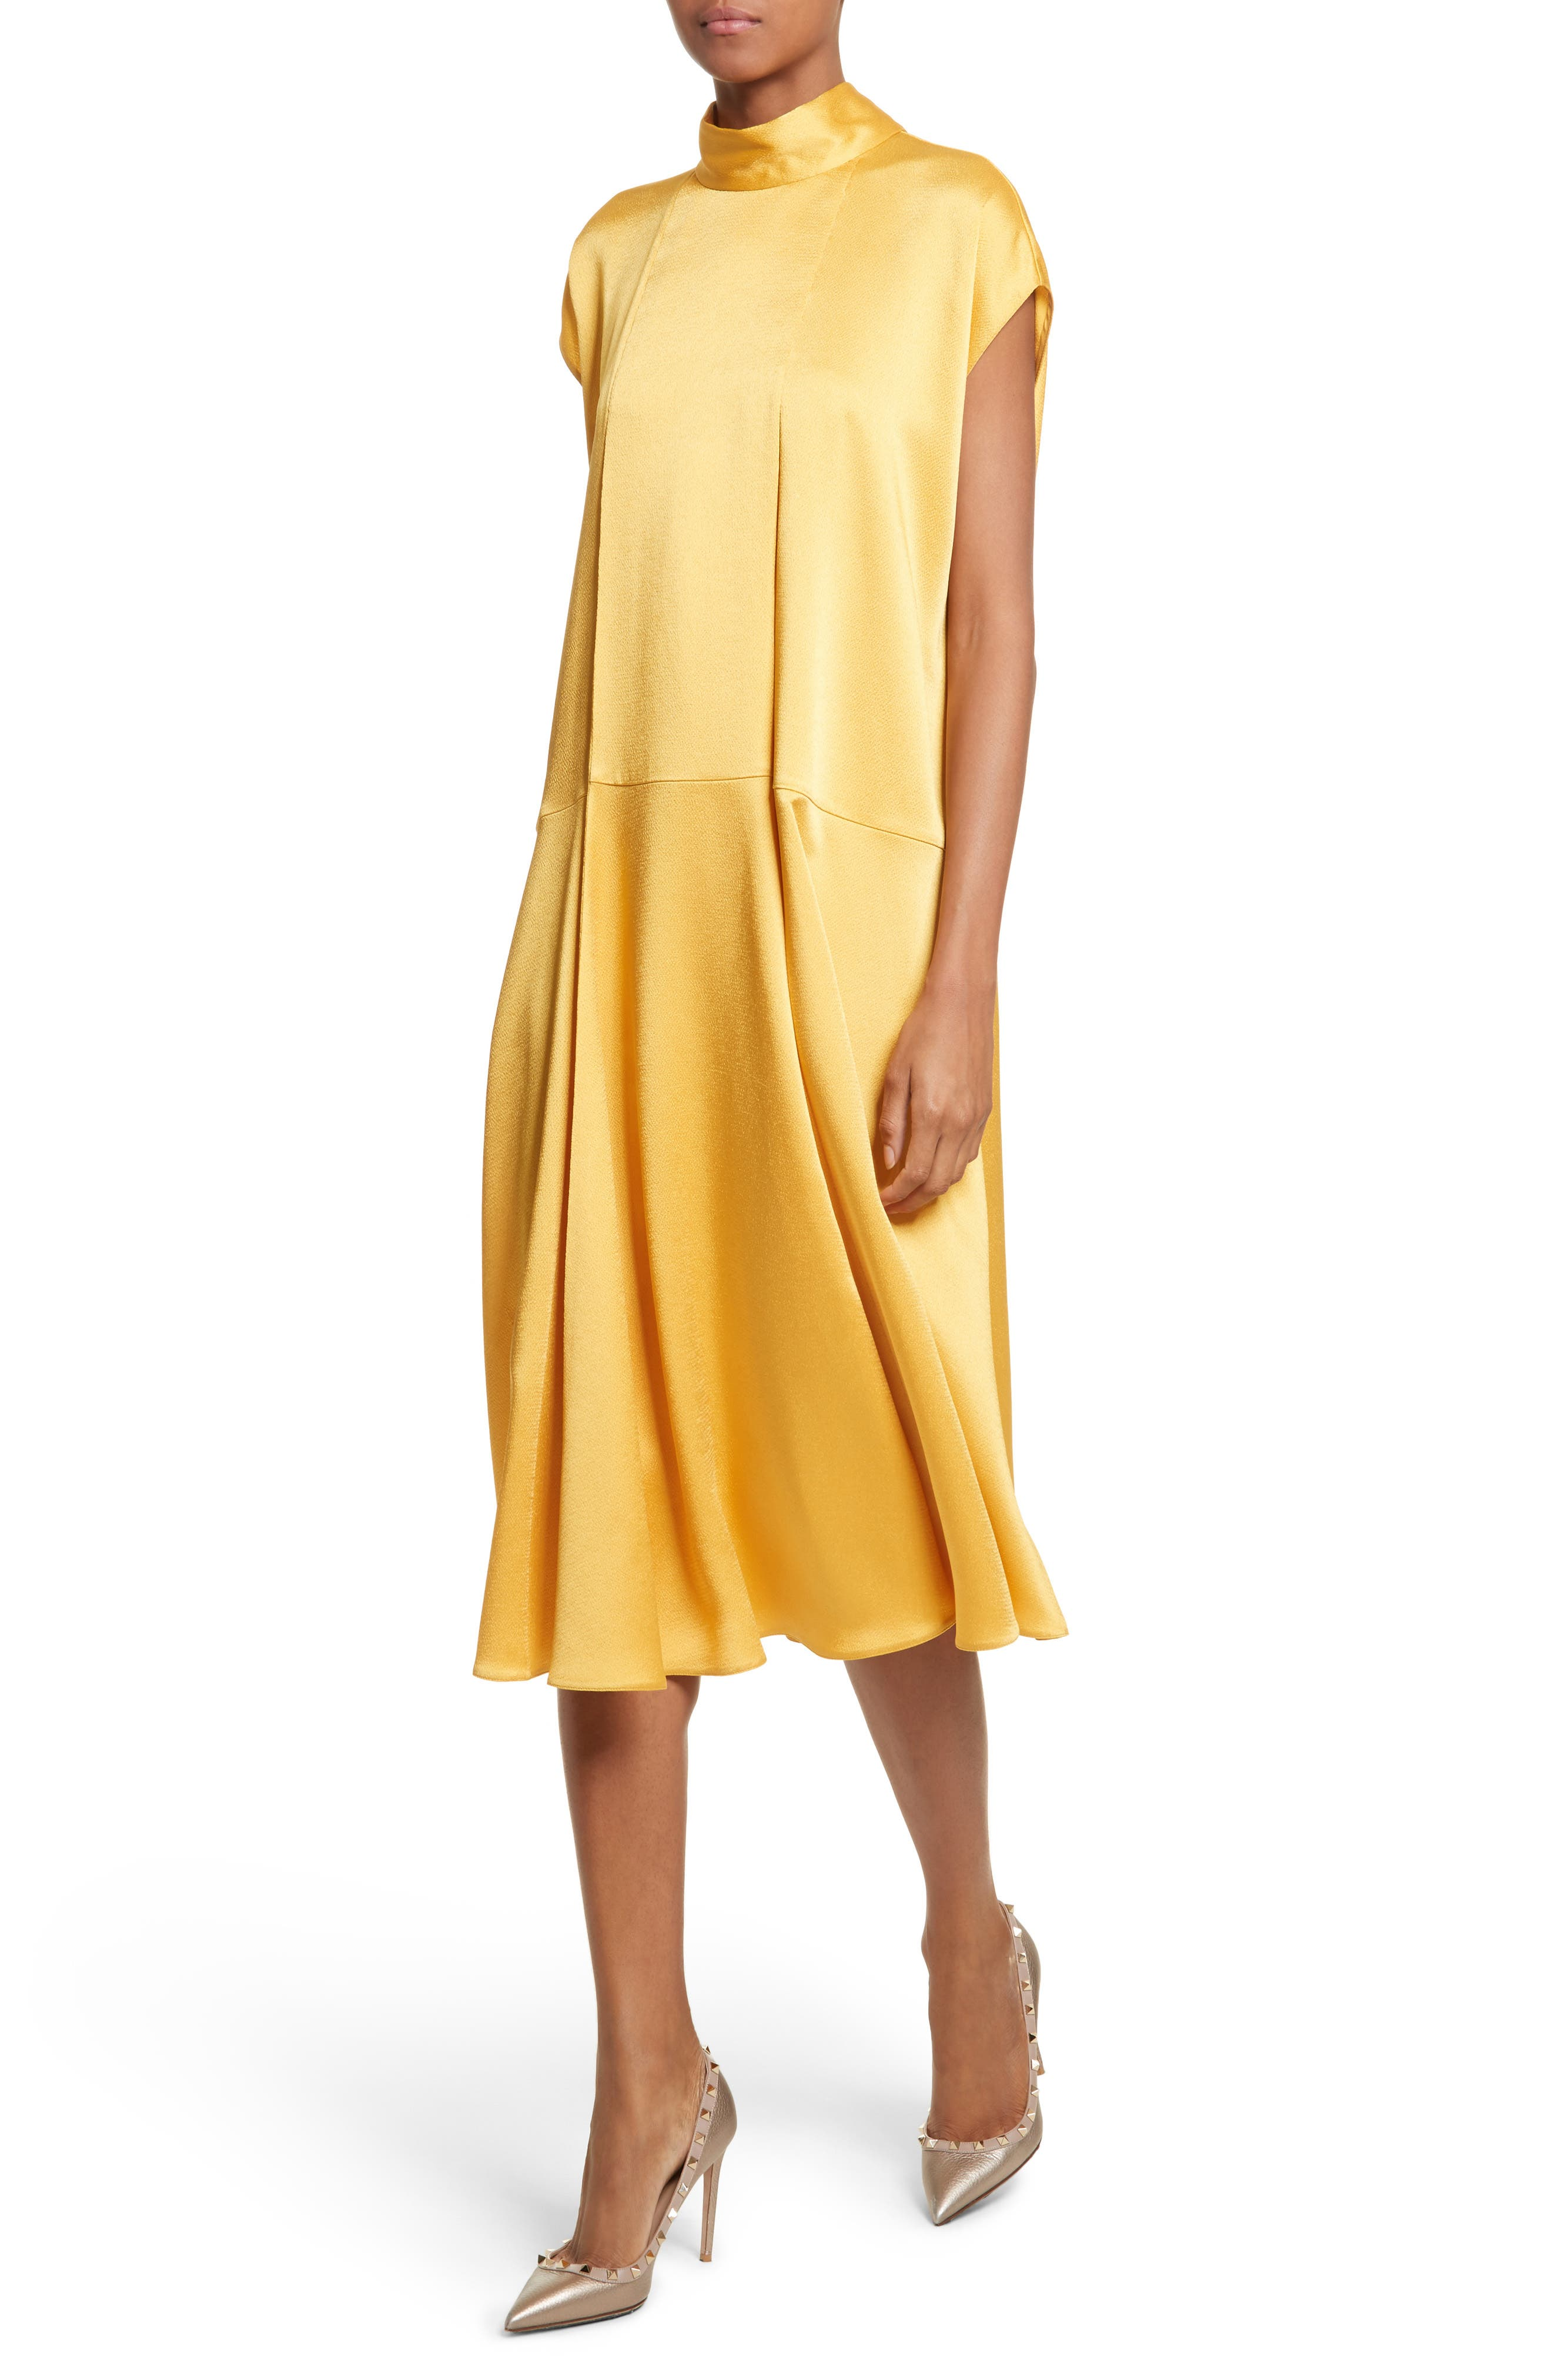 Hammered Satin Midi Dress,                             Alternate thumbnail 3, color,                             Canary Yellow